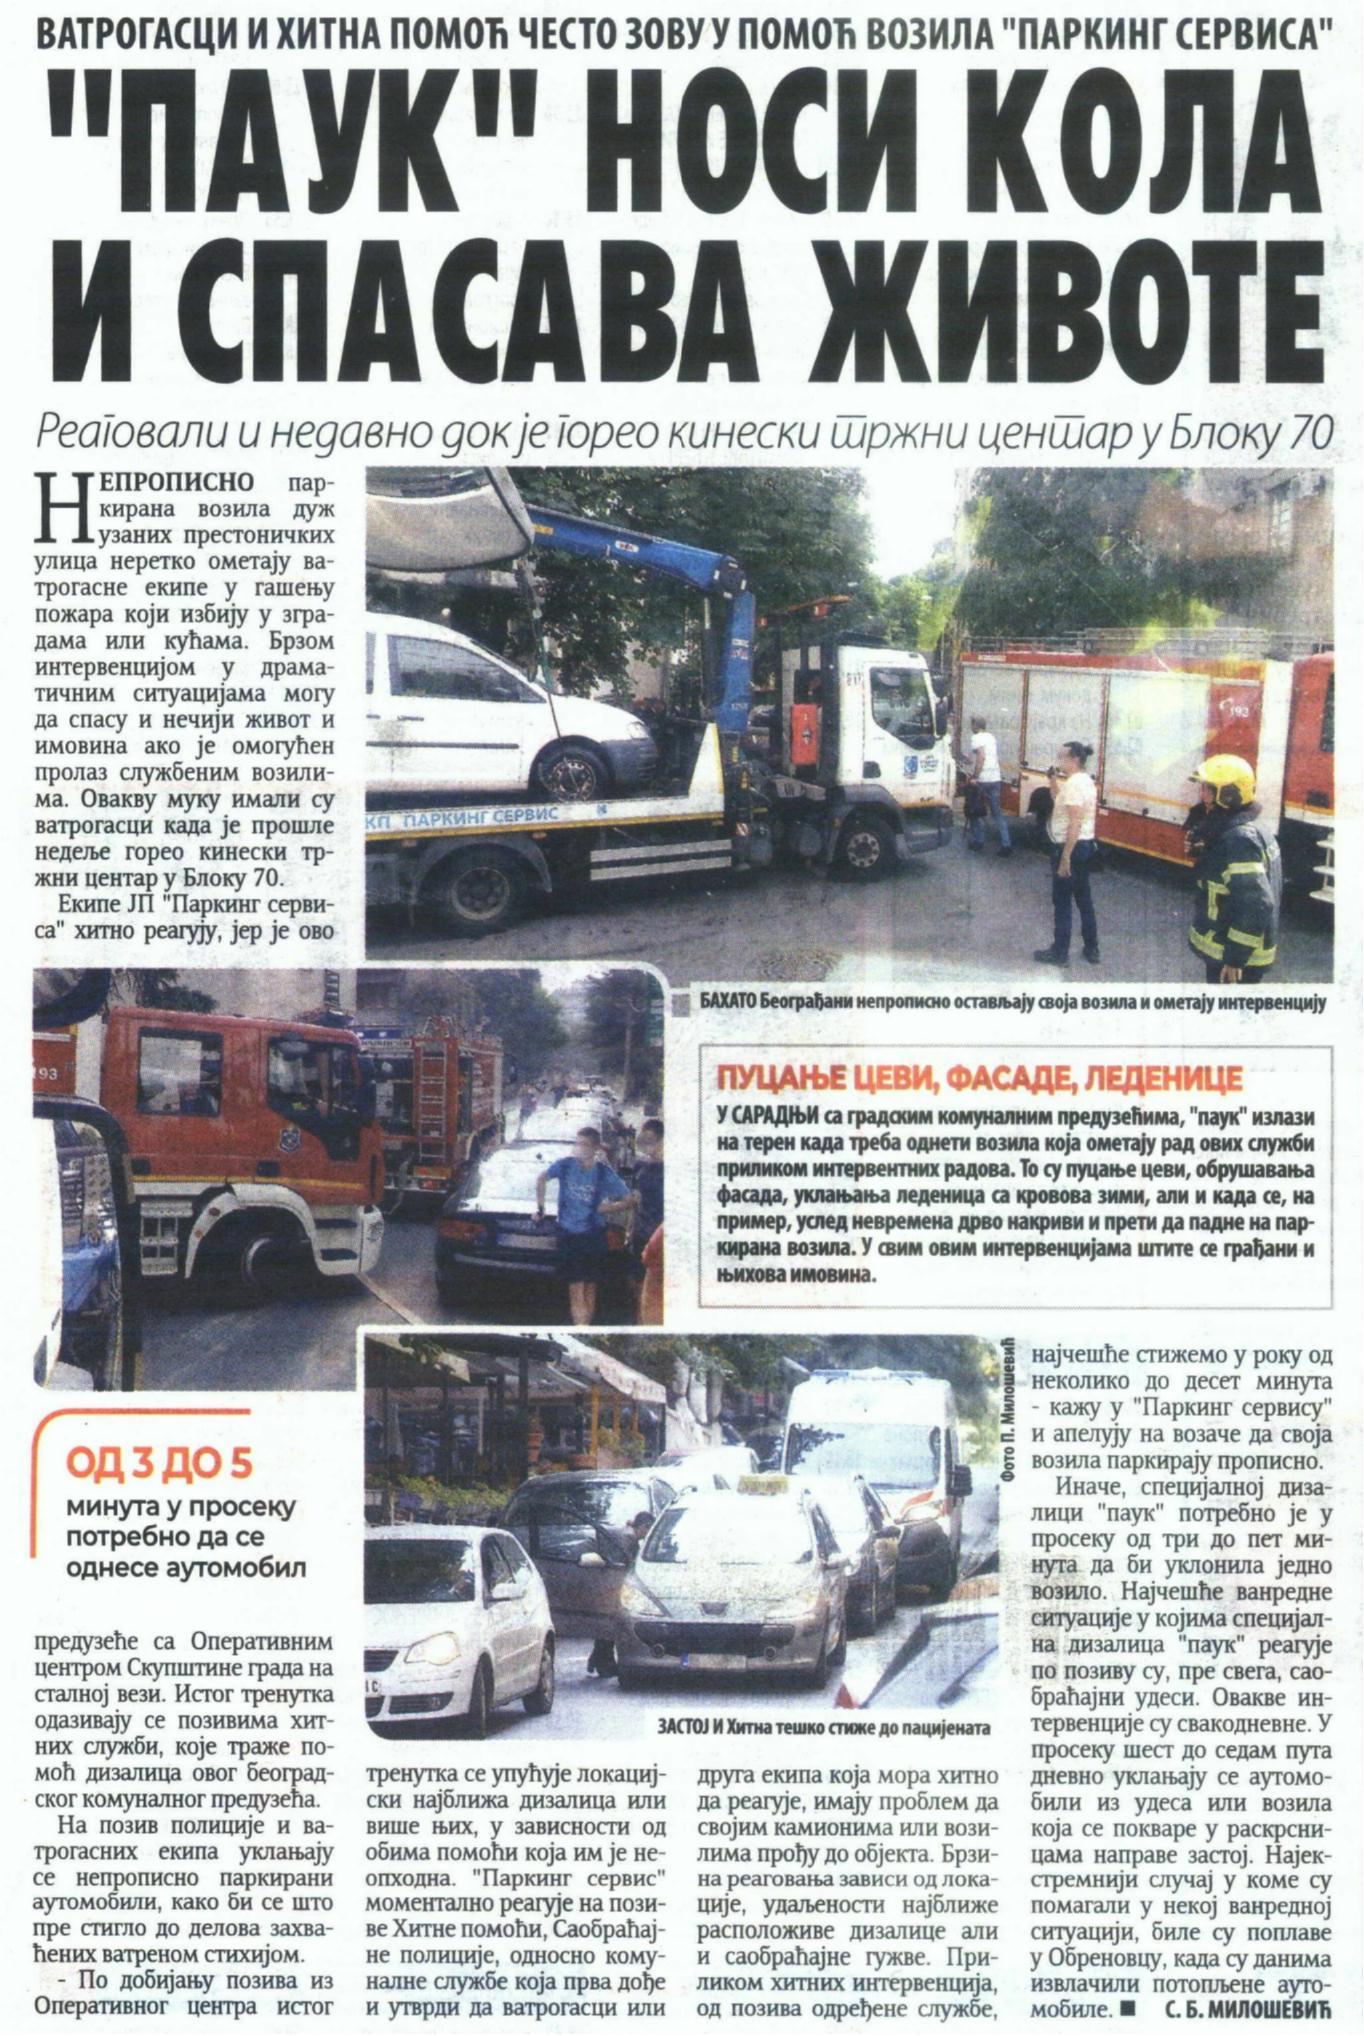 tow-truck-saves-lives-by-moving-cars-vecernje-novosti-18082021-0